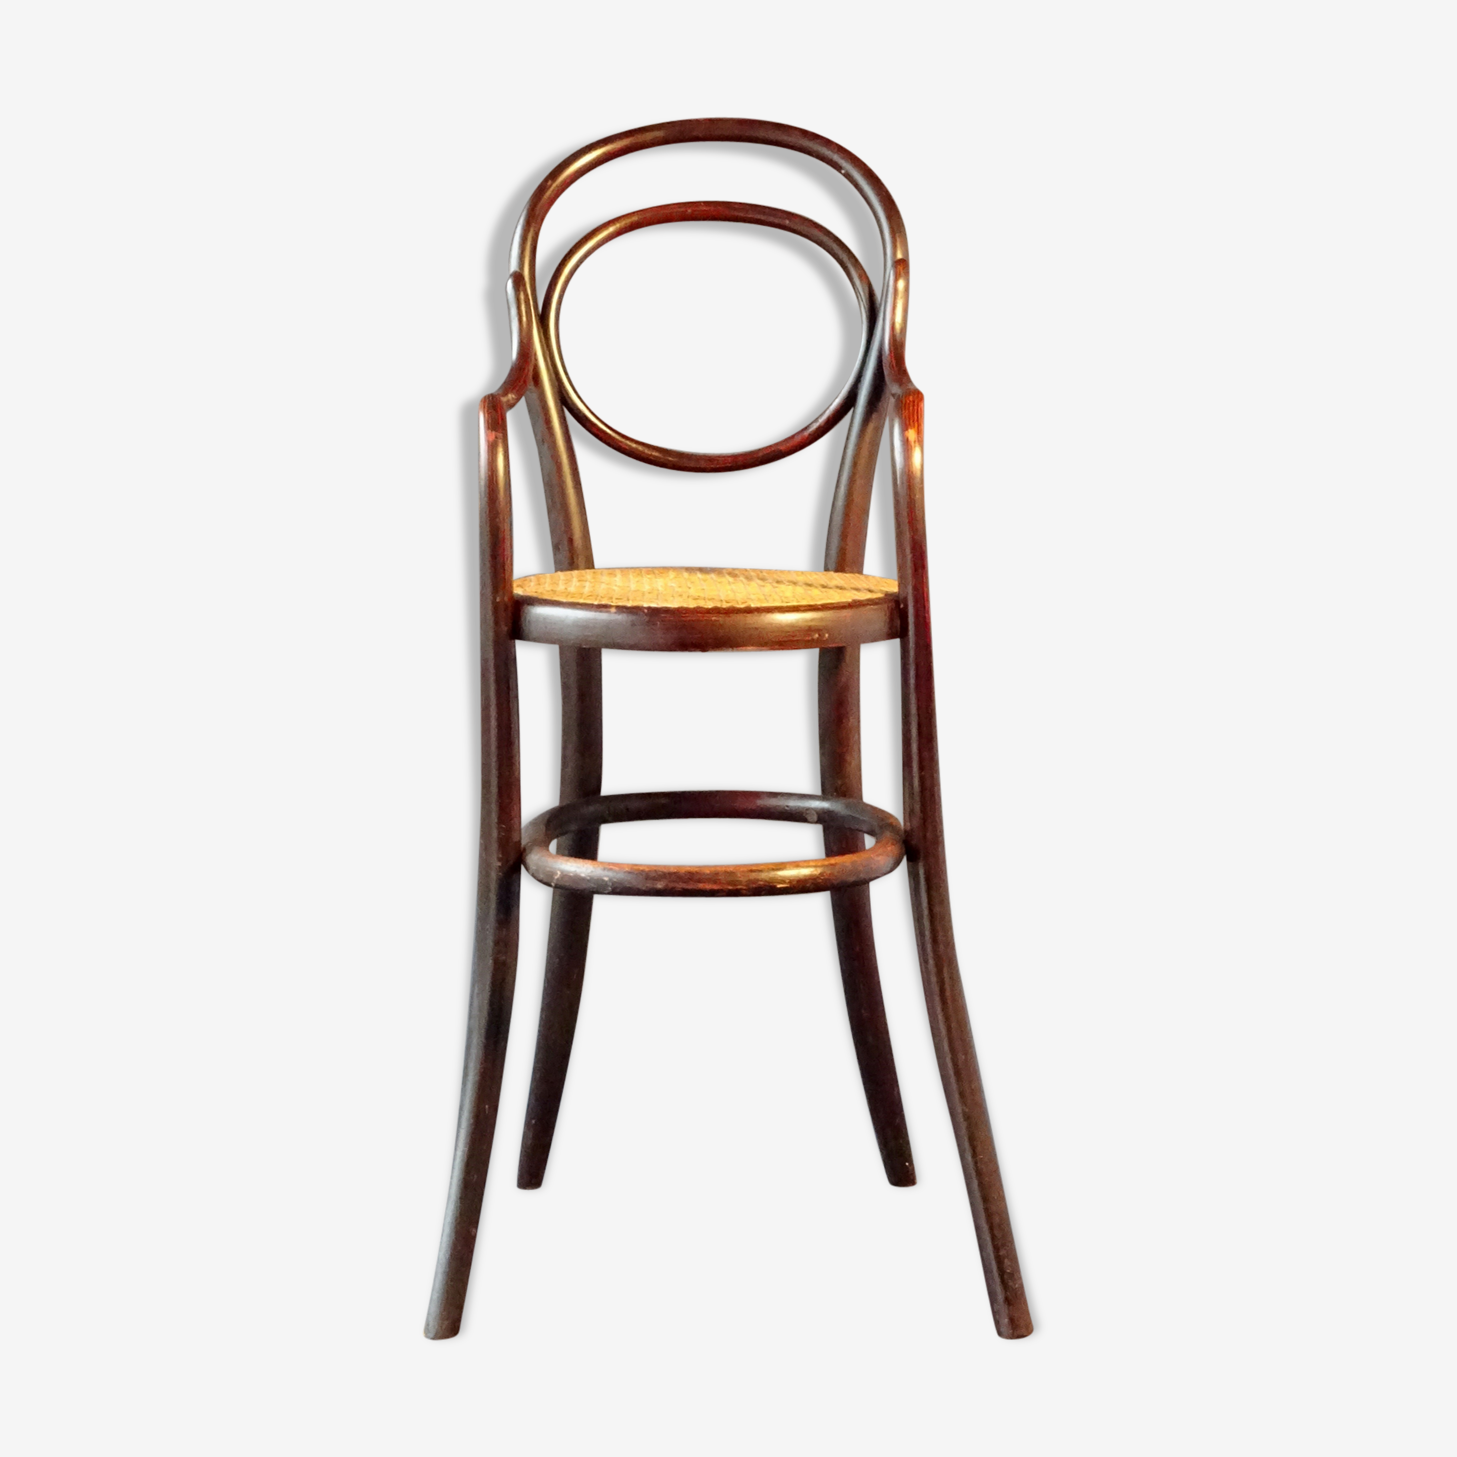 Baby chair Thonet 1870